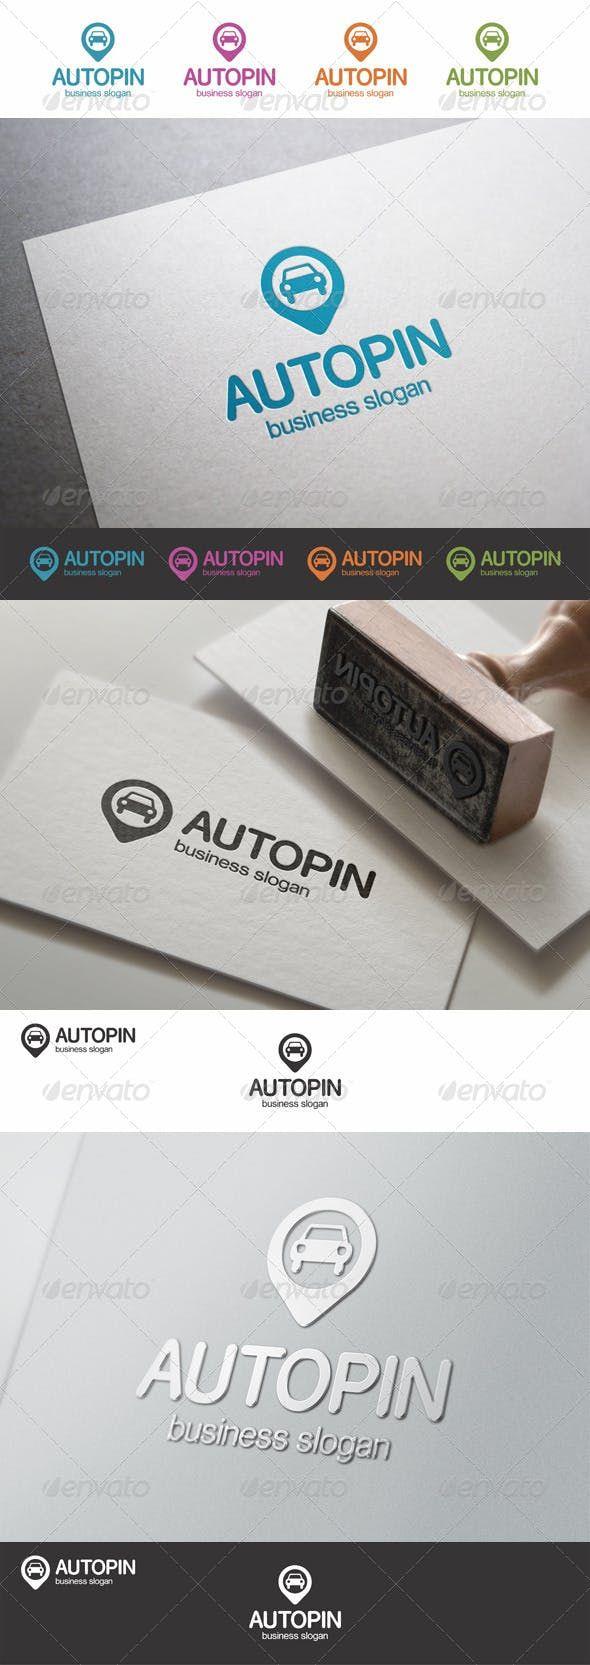 Find Car Pin Logo Avocat